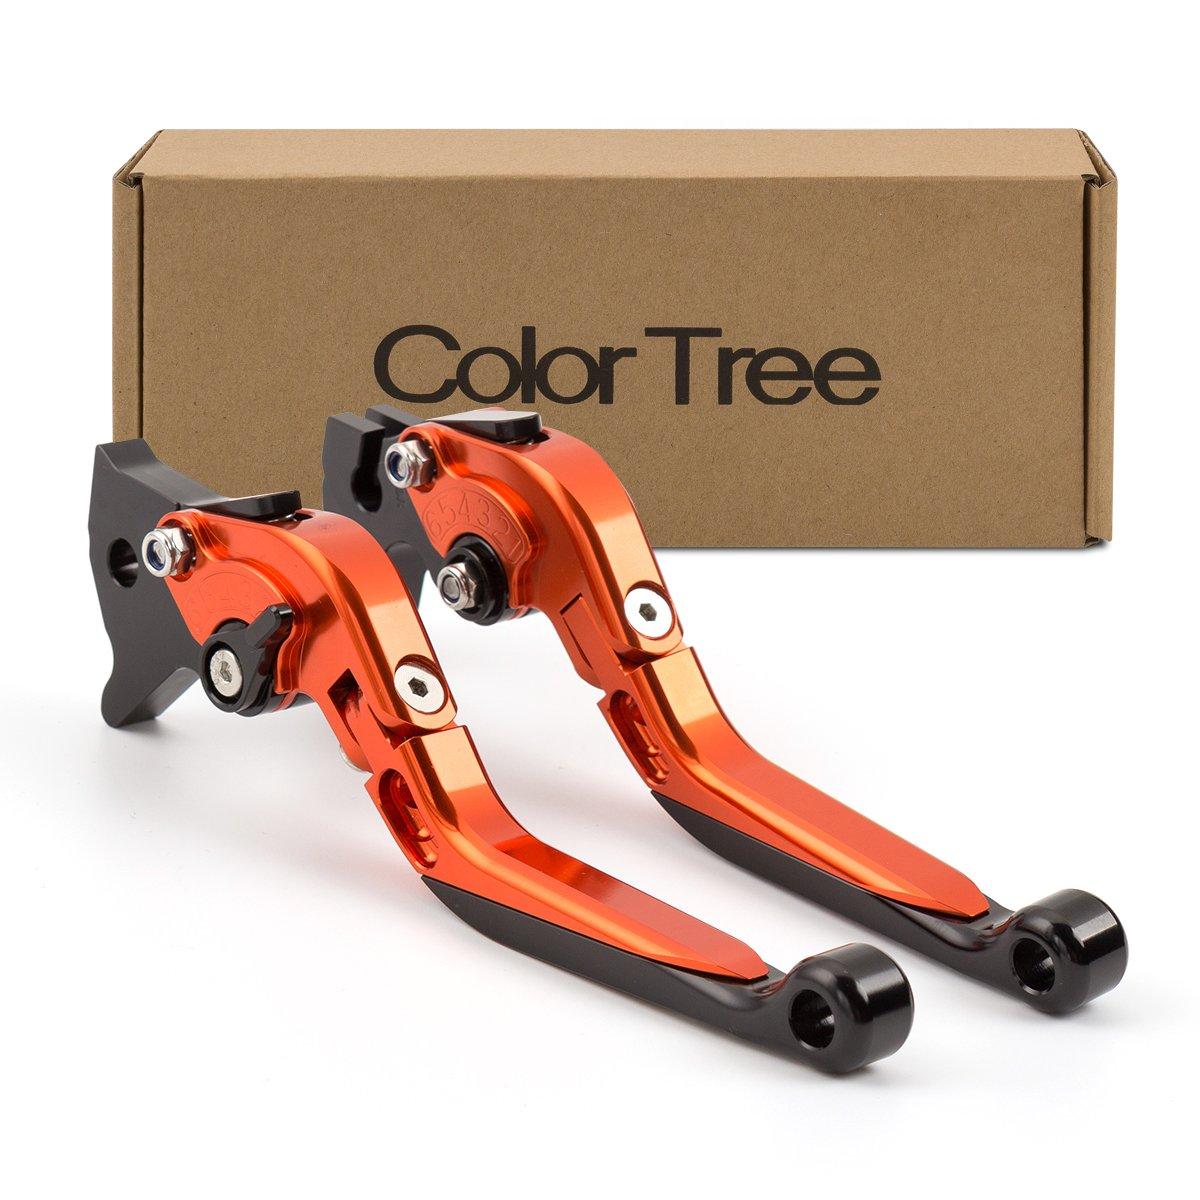 color tree Racing Adjustable CNC Folding Extending Brake Clutch Levers Pair Fit For KTM 390 Duke/RC390 2013-2017, 200 Duke/RC200 2014-2016,RC125/125 Duke 2014-2017 Orange&Black